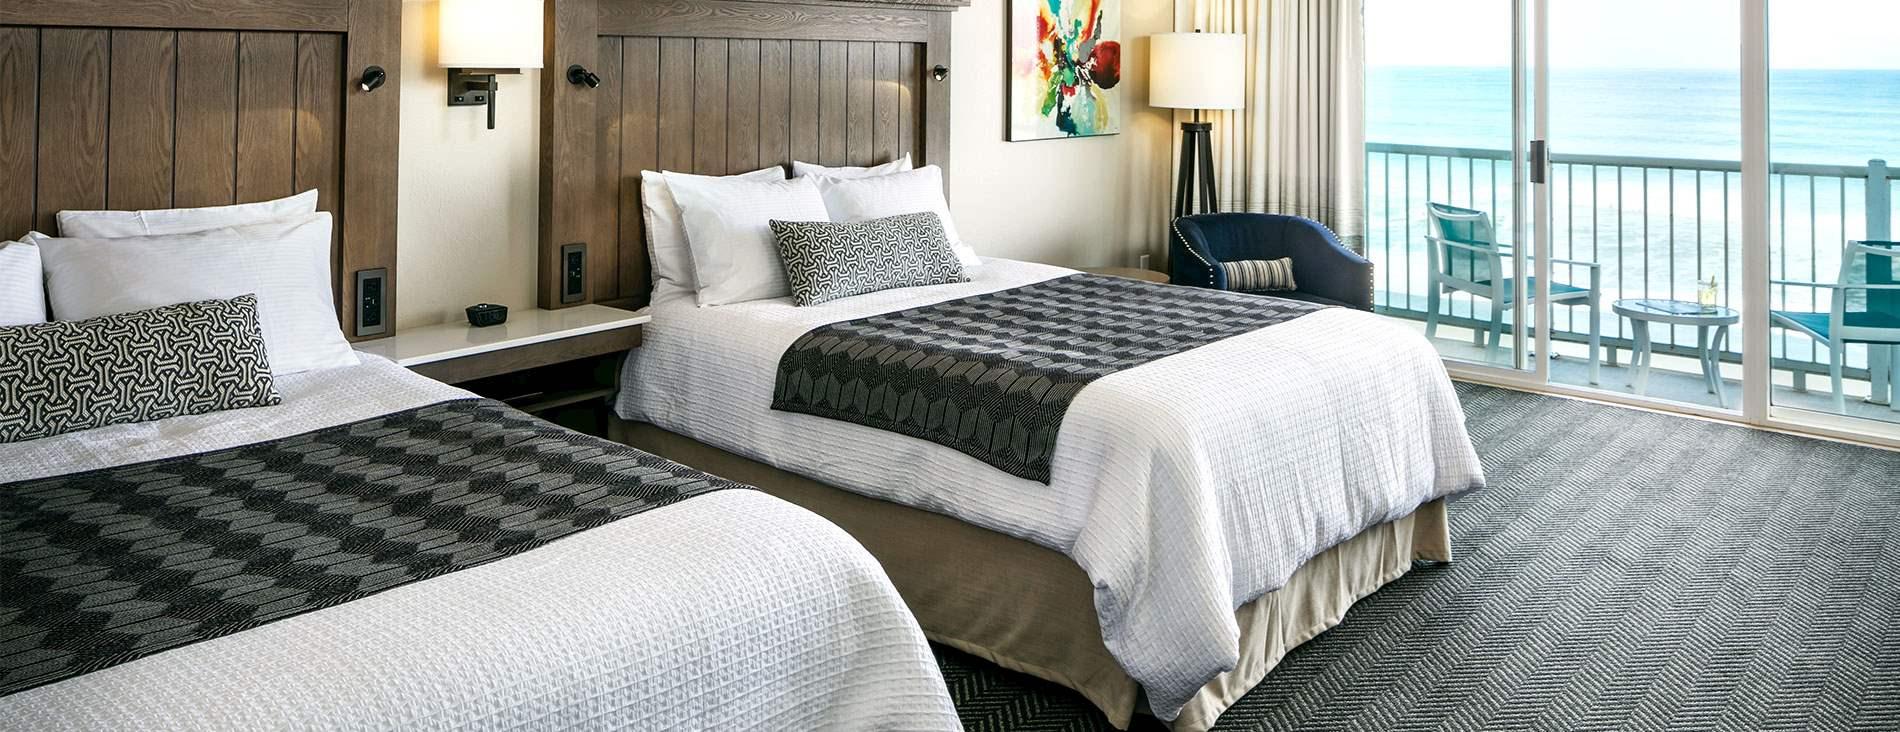 Beachfront Inn Hotel, Brookings